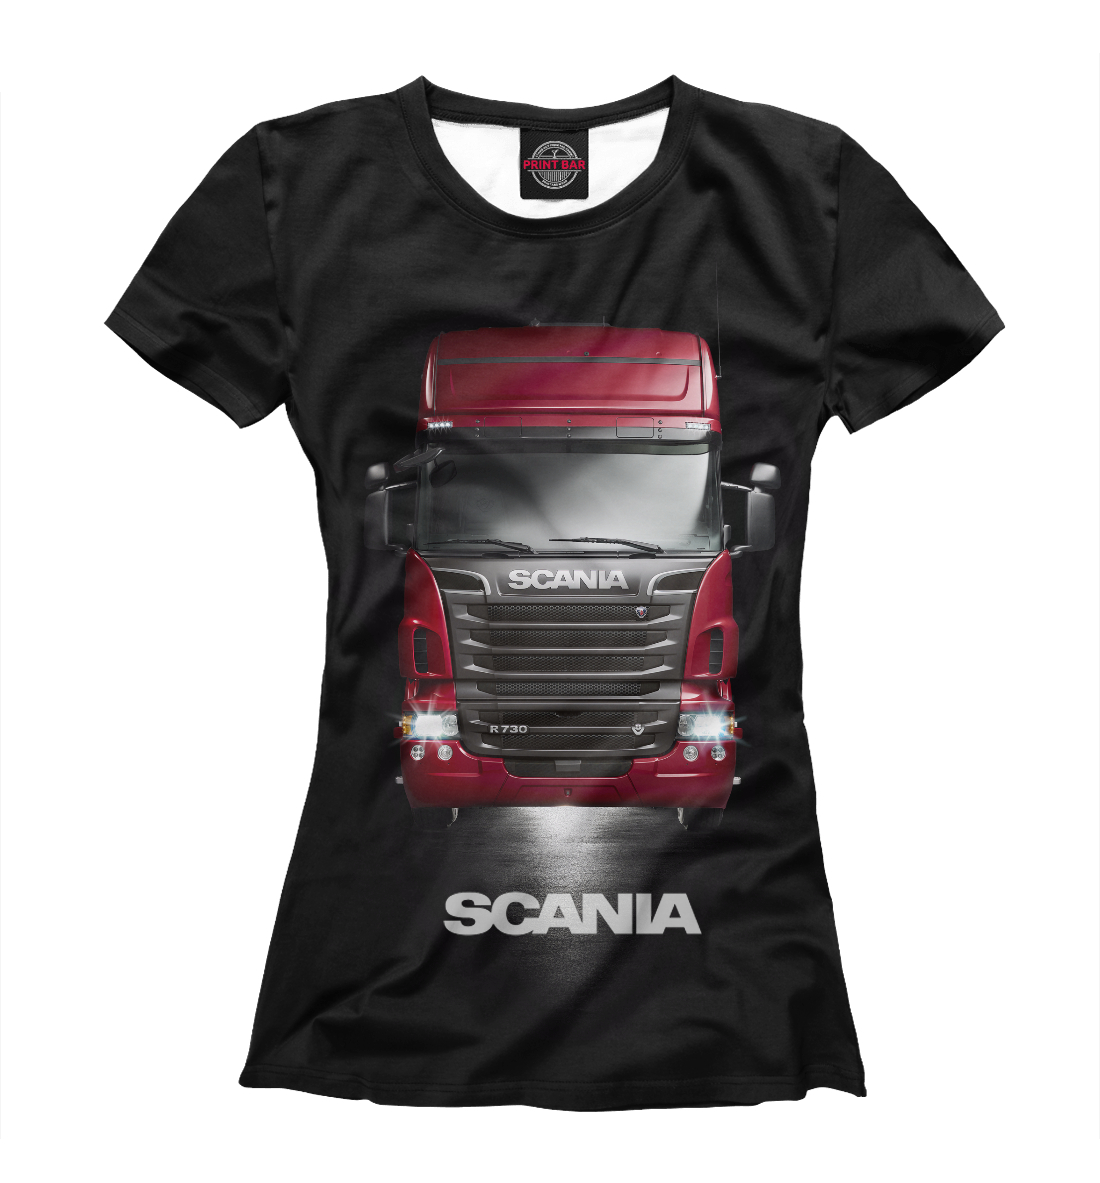 Купить Scania, Printbar, Футболки, GRZ-196237-fut-1